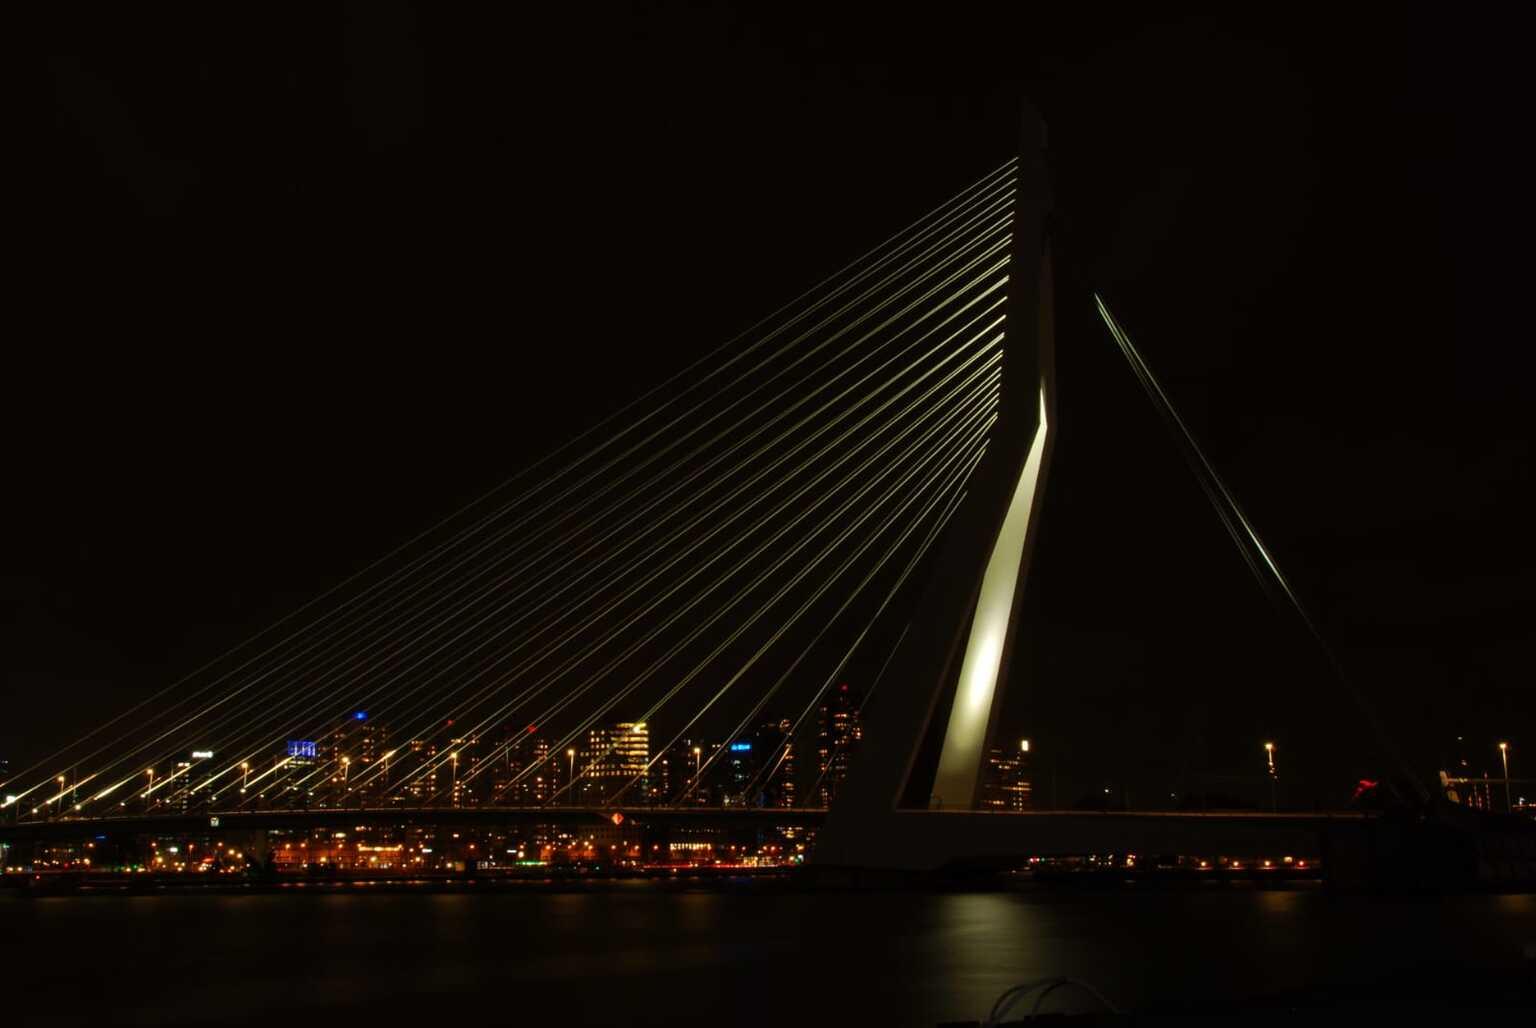 Erasmusbrug - Erasmusbrug bij nacht - foto door Semdewit op 12-04-2021 - locatie: Rotterdam, Nederland - deze foto bevat: water, lucht, elektriciteit, torenblok, stadsgezicht, toren, brug, stad, tuibrug, middernacht